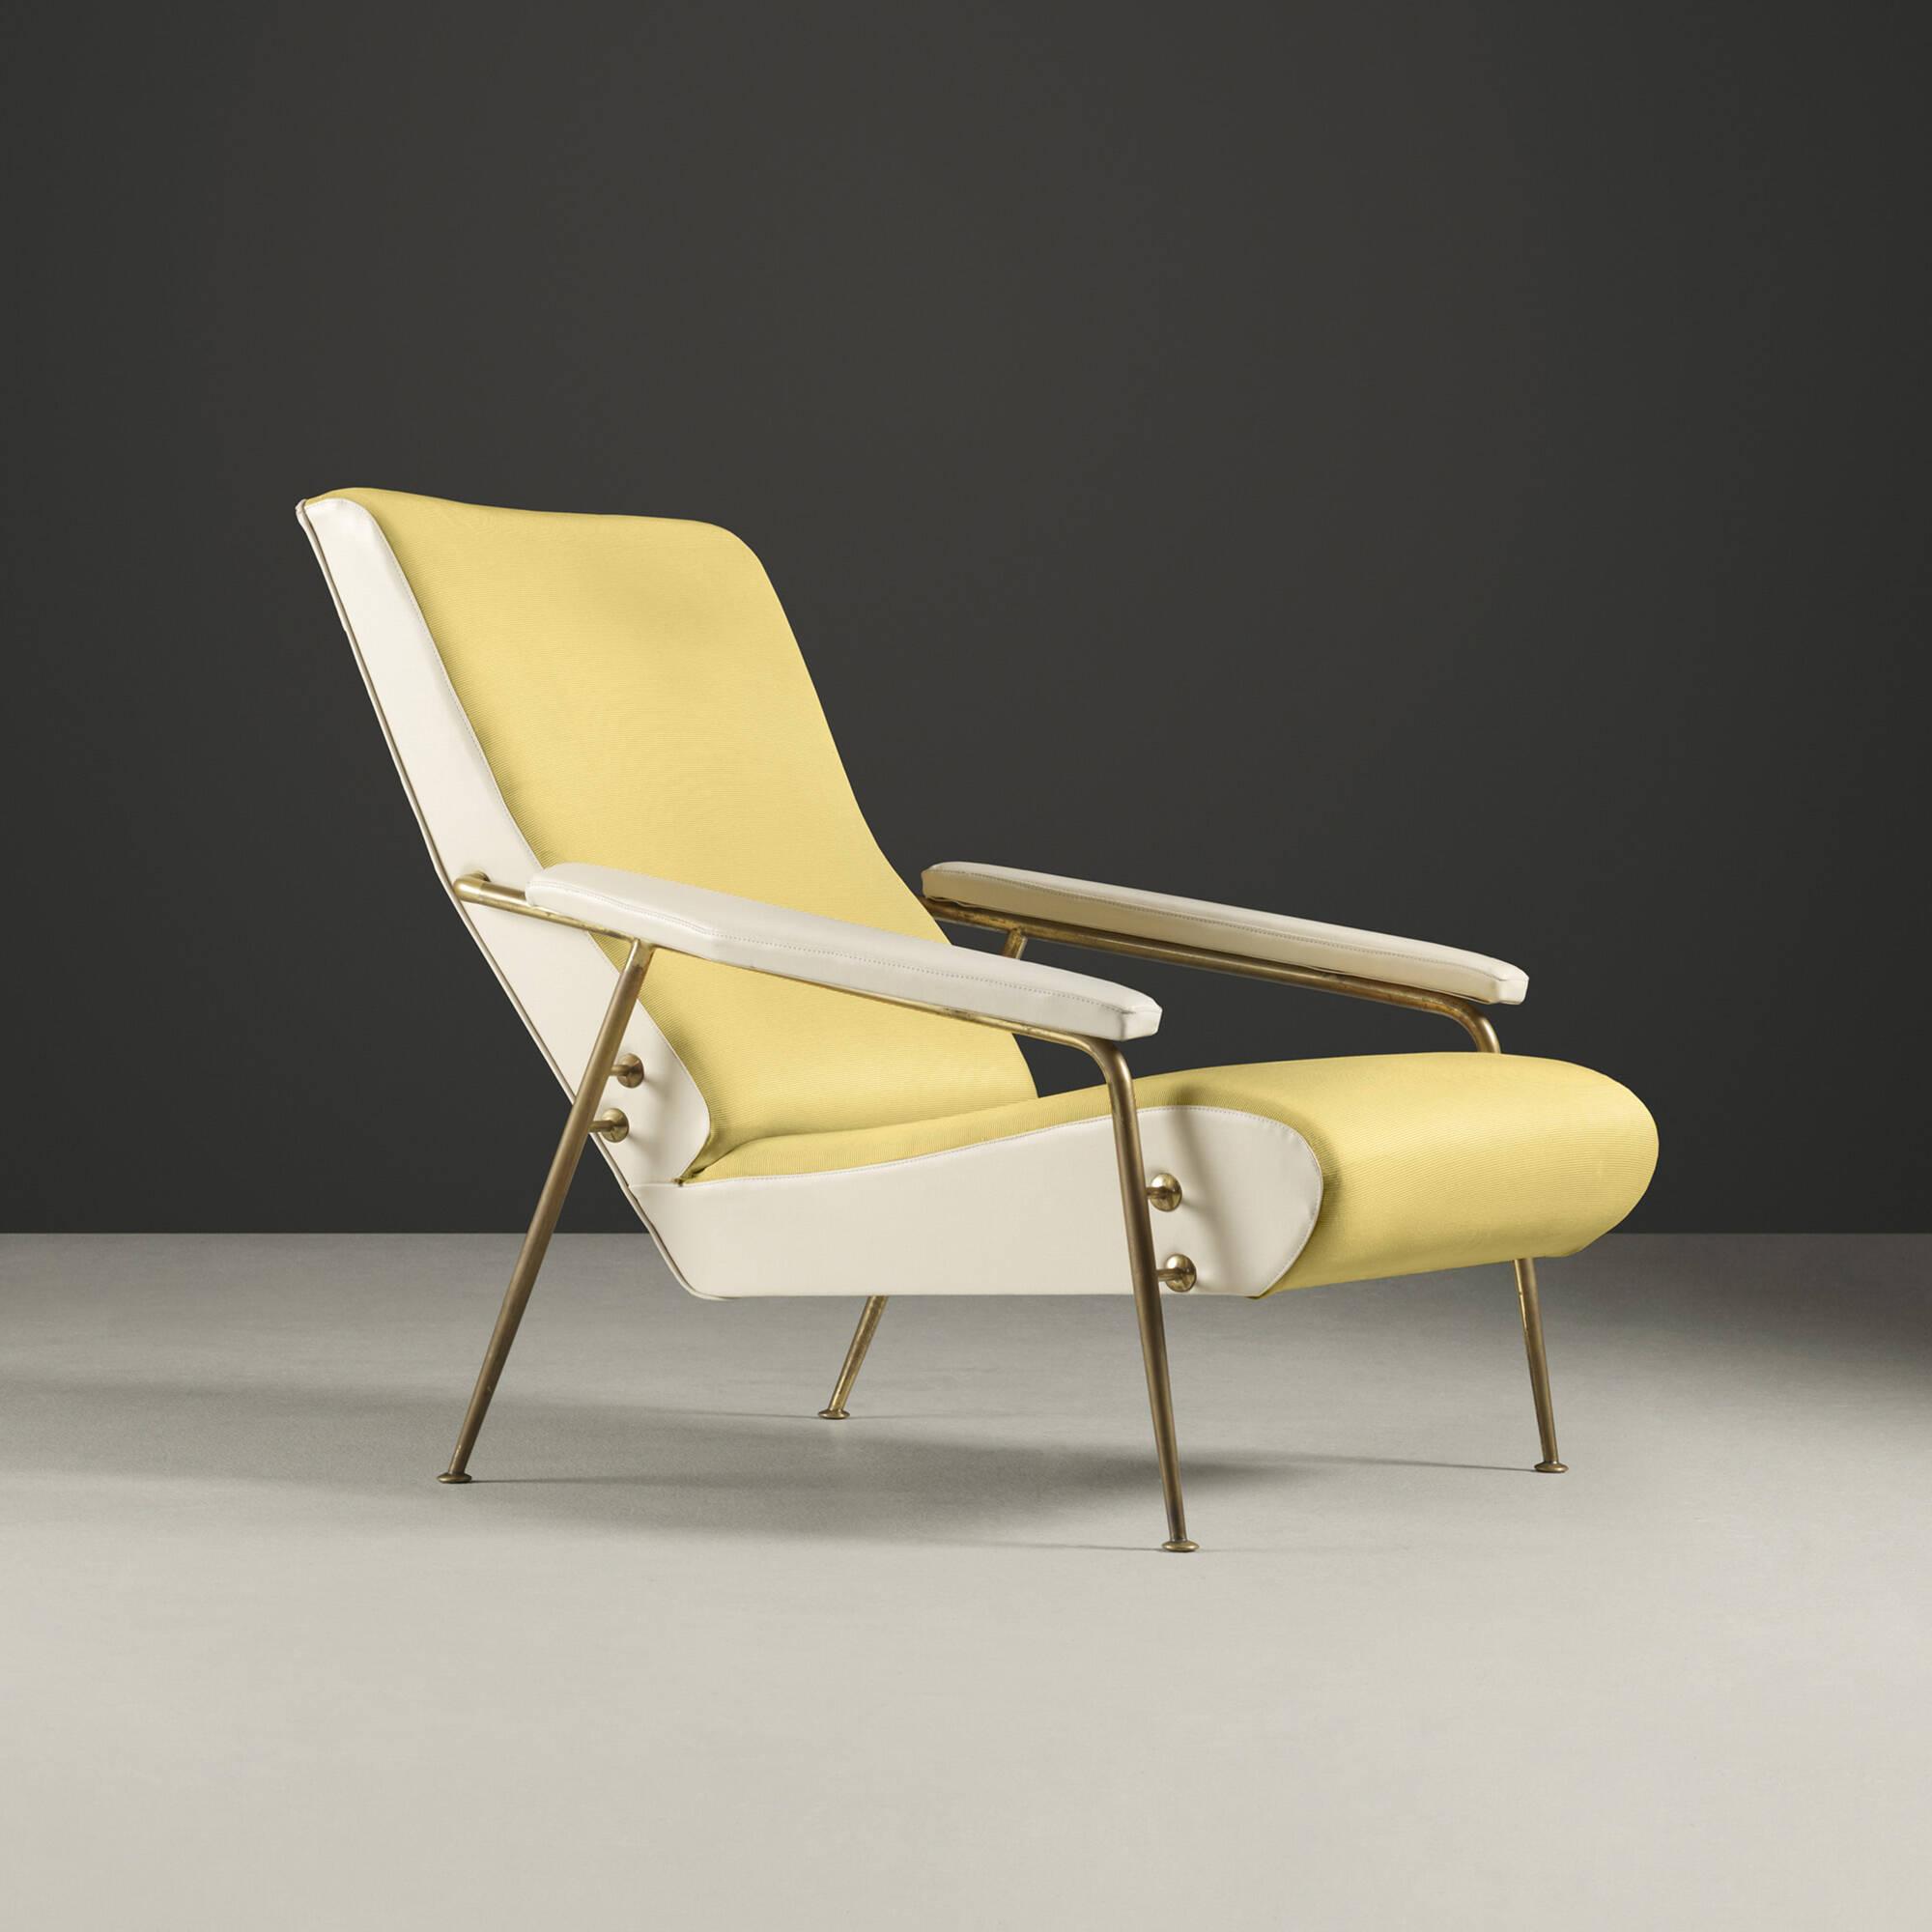 111 Gio Ponti Distex lounge chair model 807 Italian